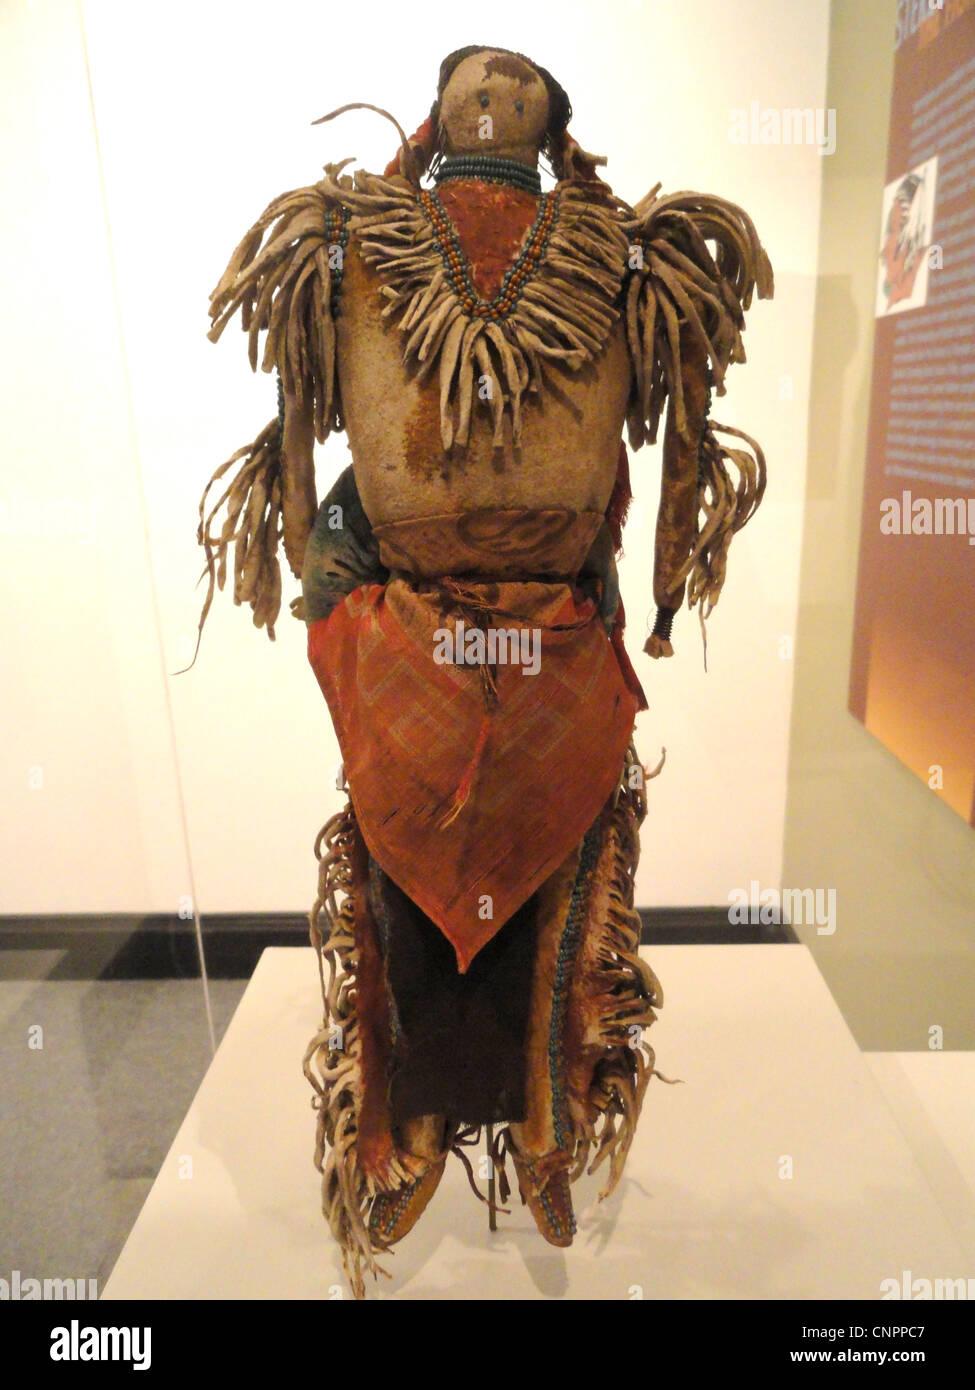 Warrior doll, with symbols of Lakota religion - Native American collection - Peabody Museum, Harvard University - Stock Image